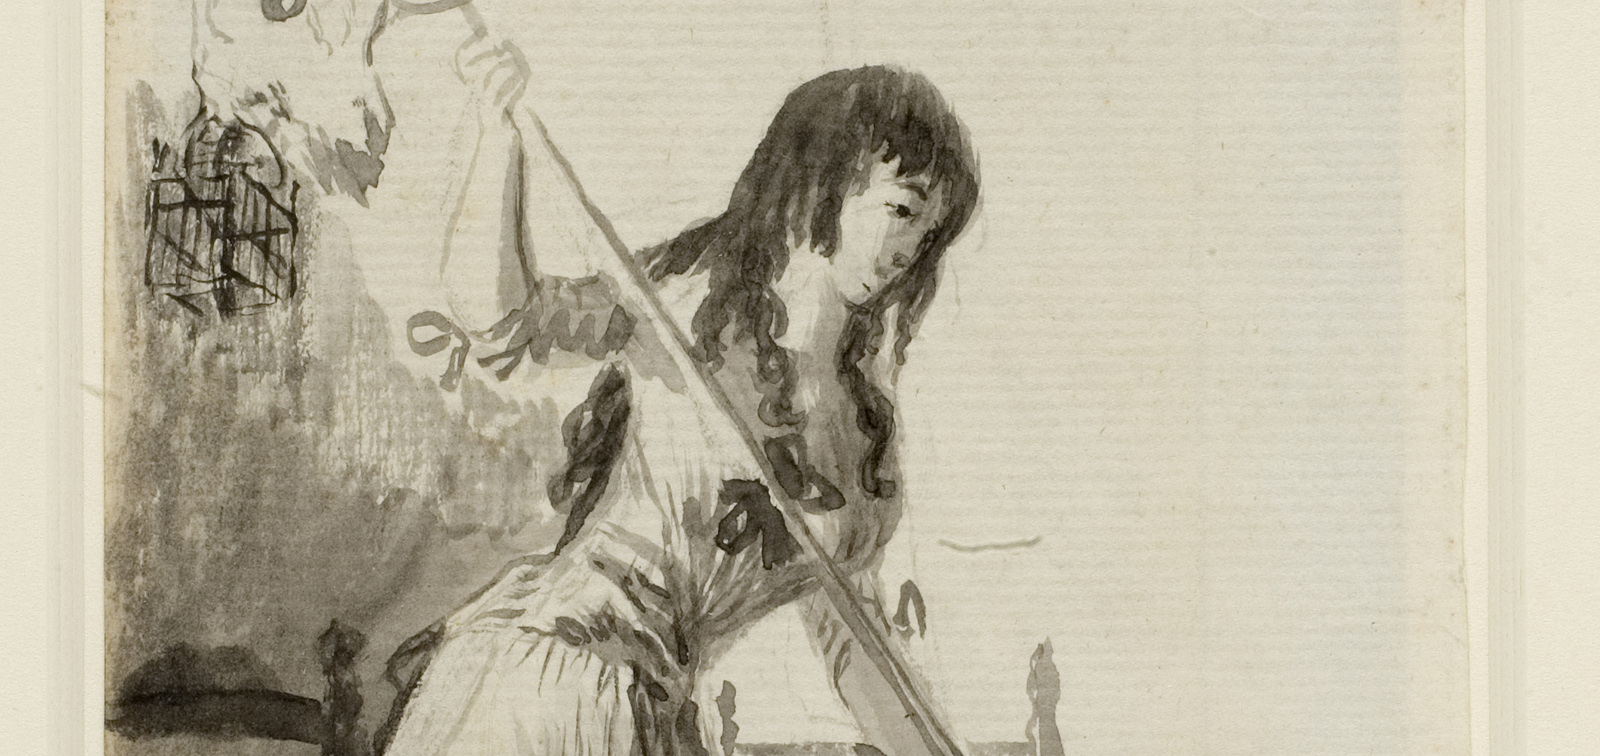 Goya and more